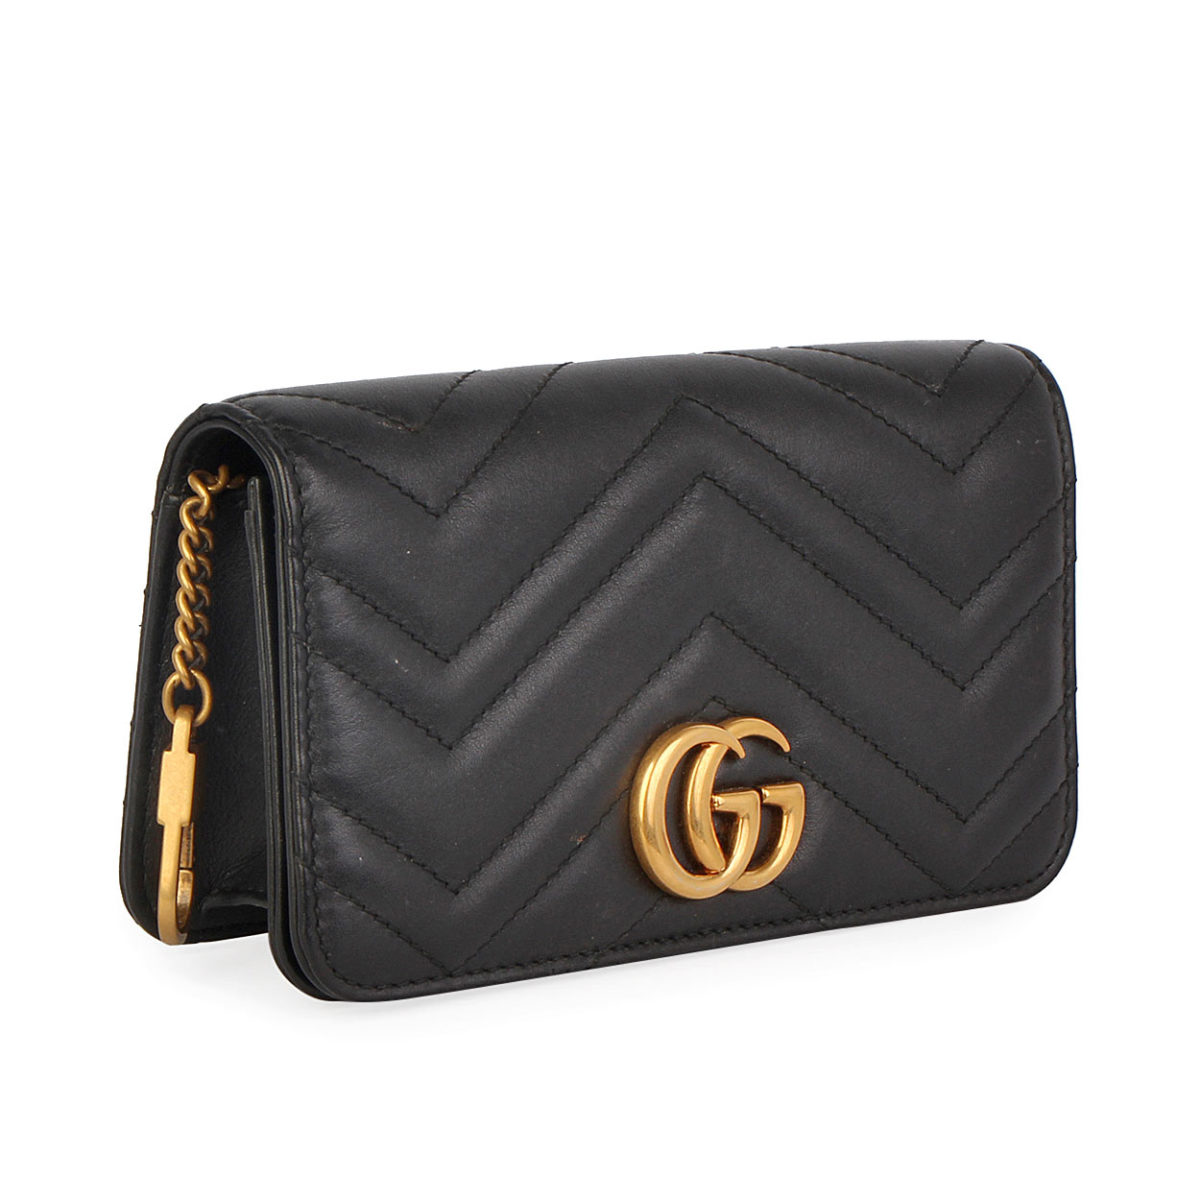 5d186628a678 Gucci Black Marmont Mini Matelasse Crossbody Bag   Stanford Center ...